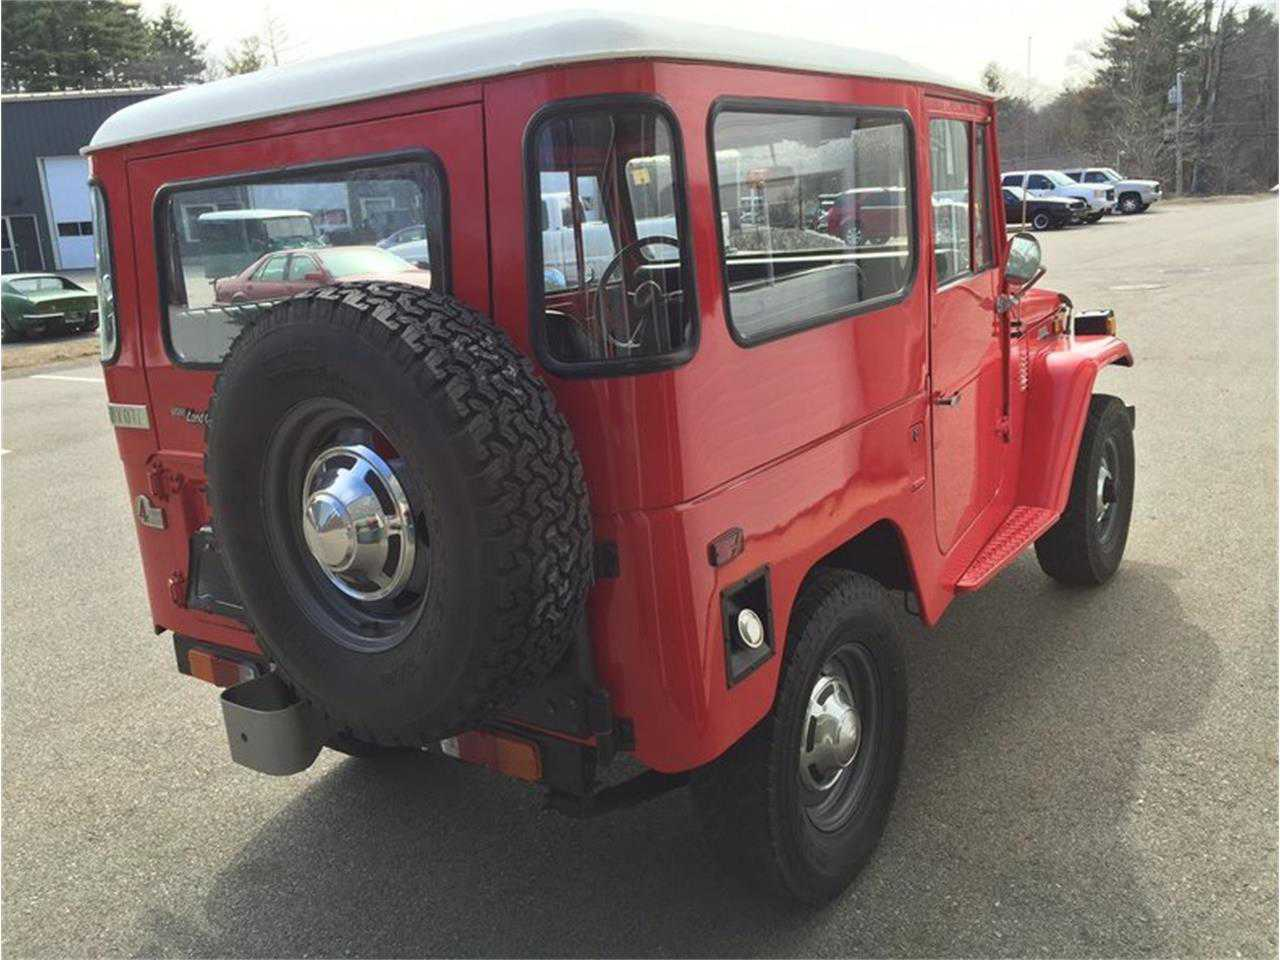 1973 Toyota Land Cruiser Fj40 For Sale In